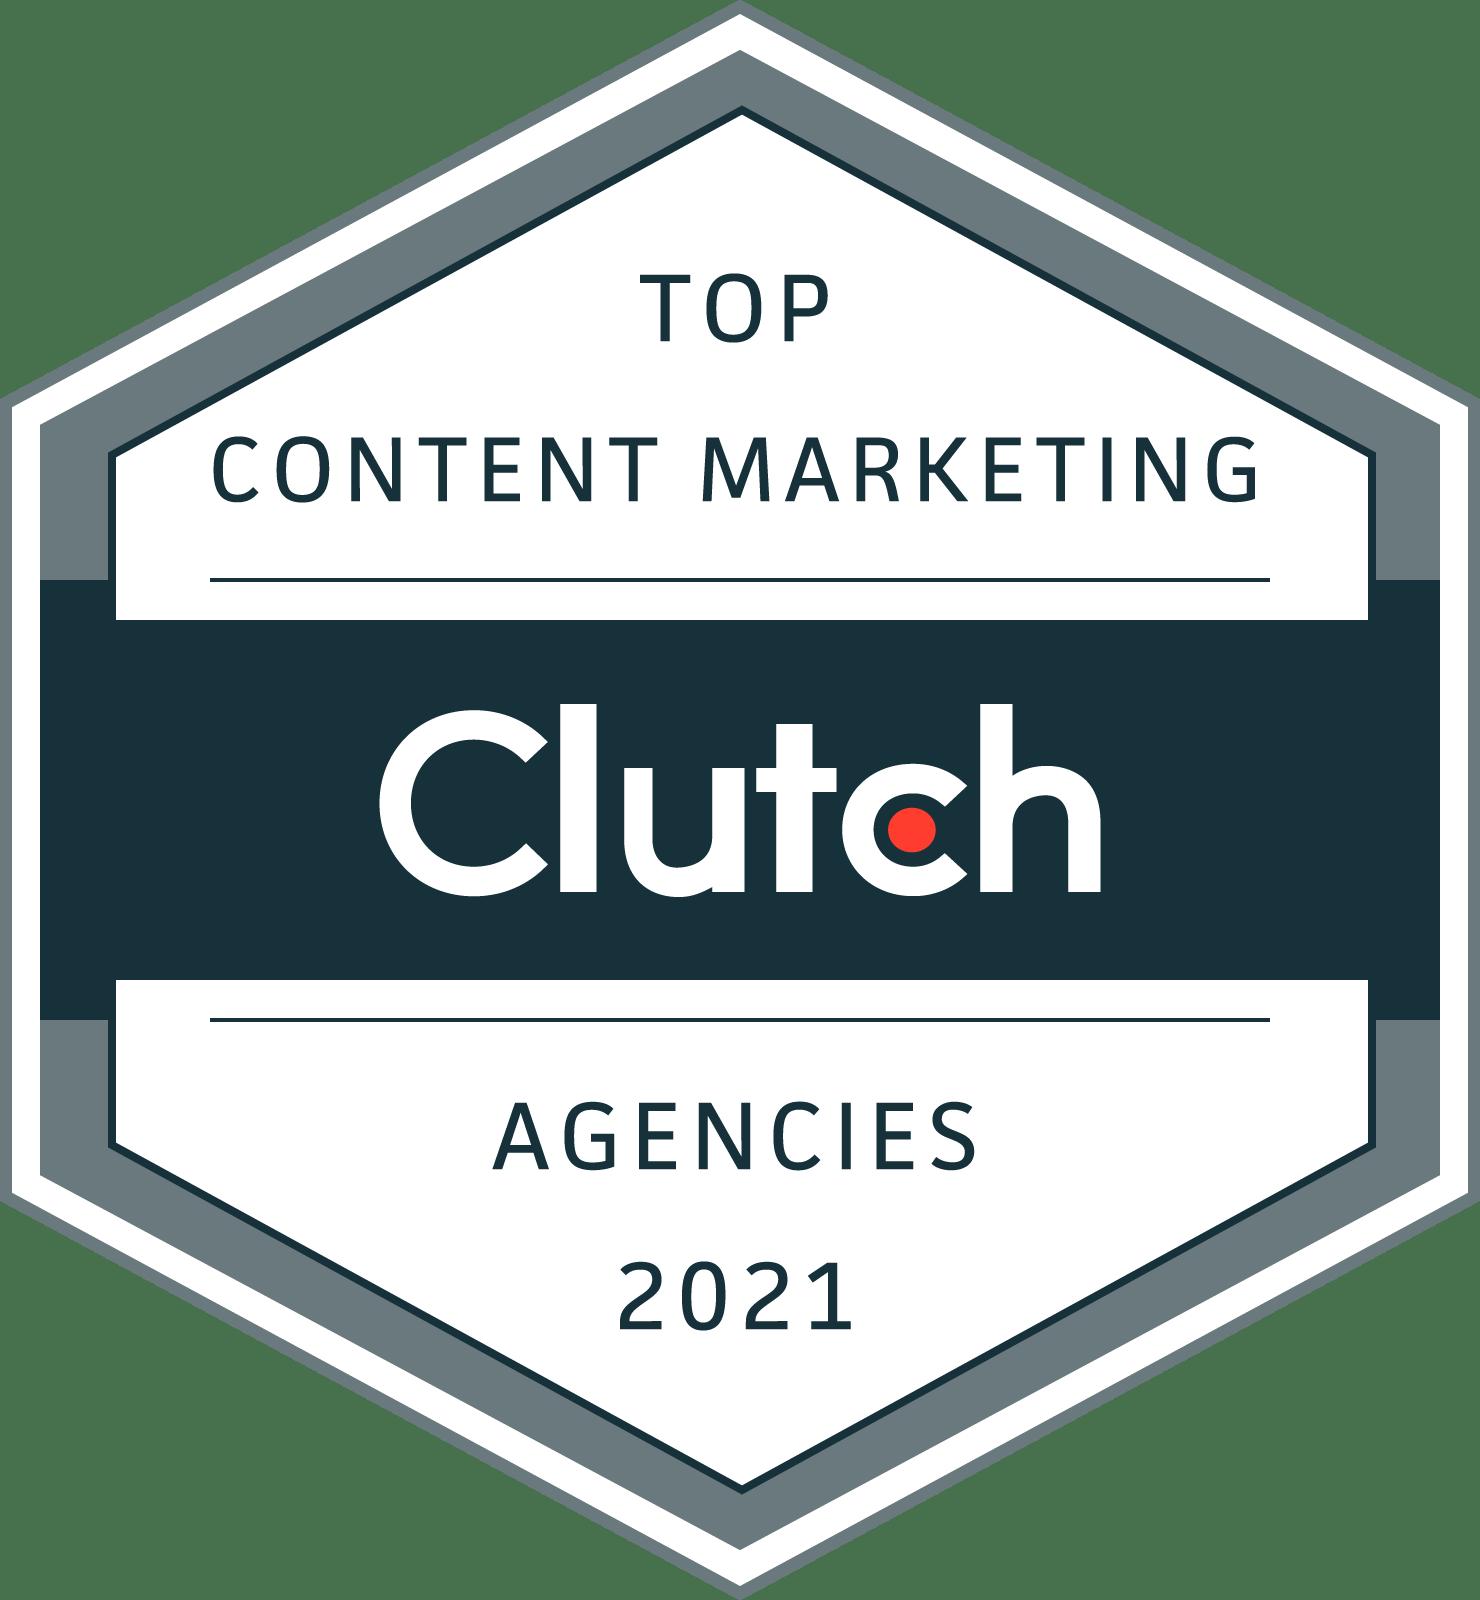 Clutch award for top content marketing agencies, 2021